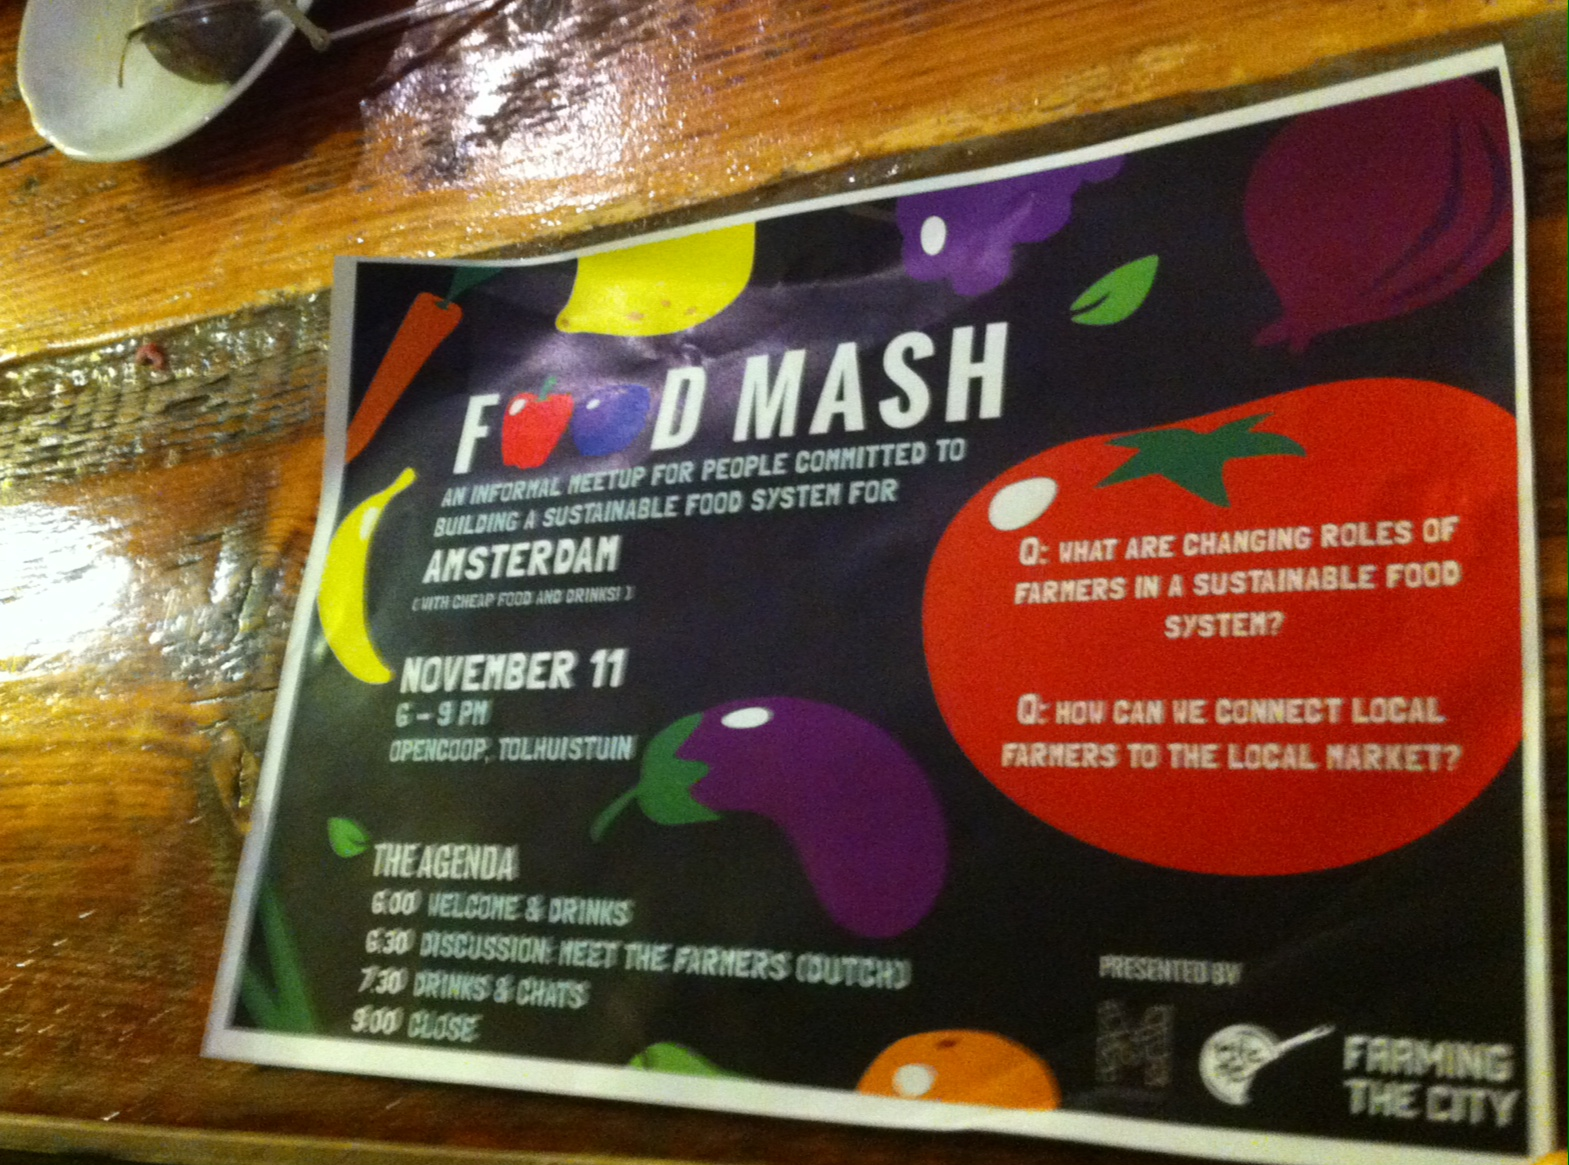 food mash poster wood